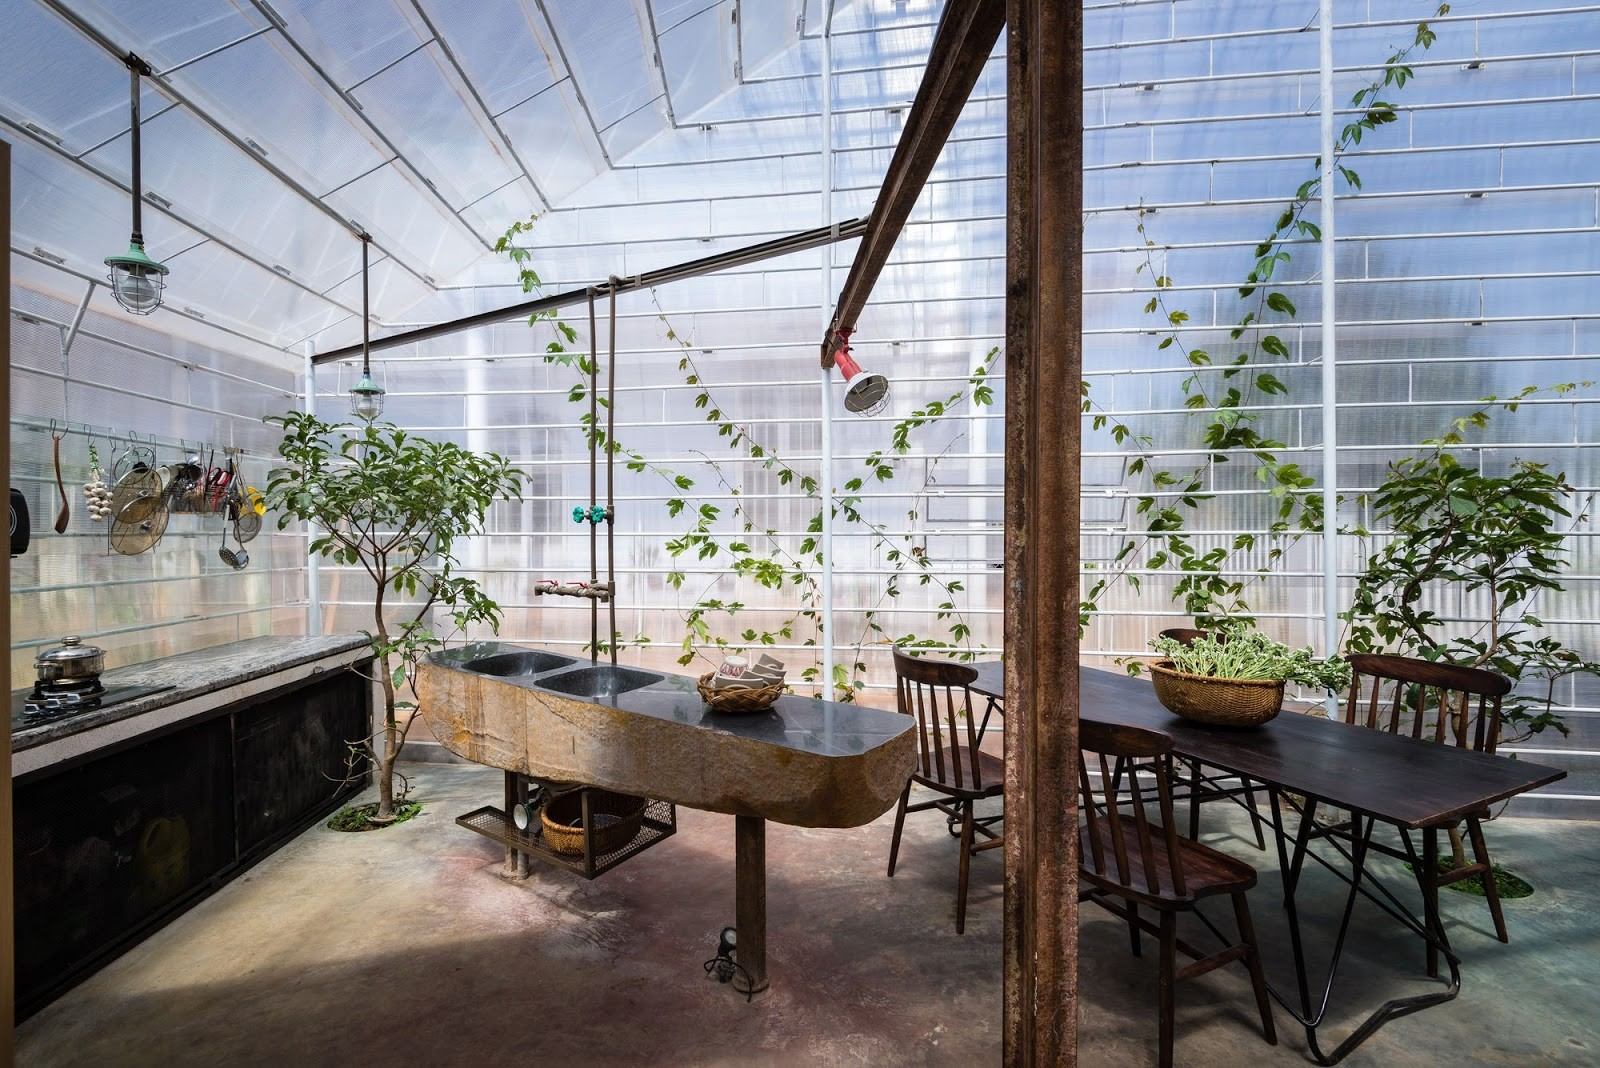 FA house by atelier tho.A, Dalat, Vietnam